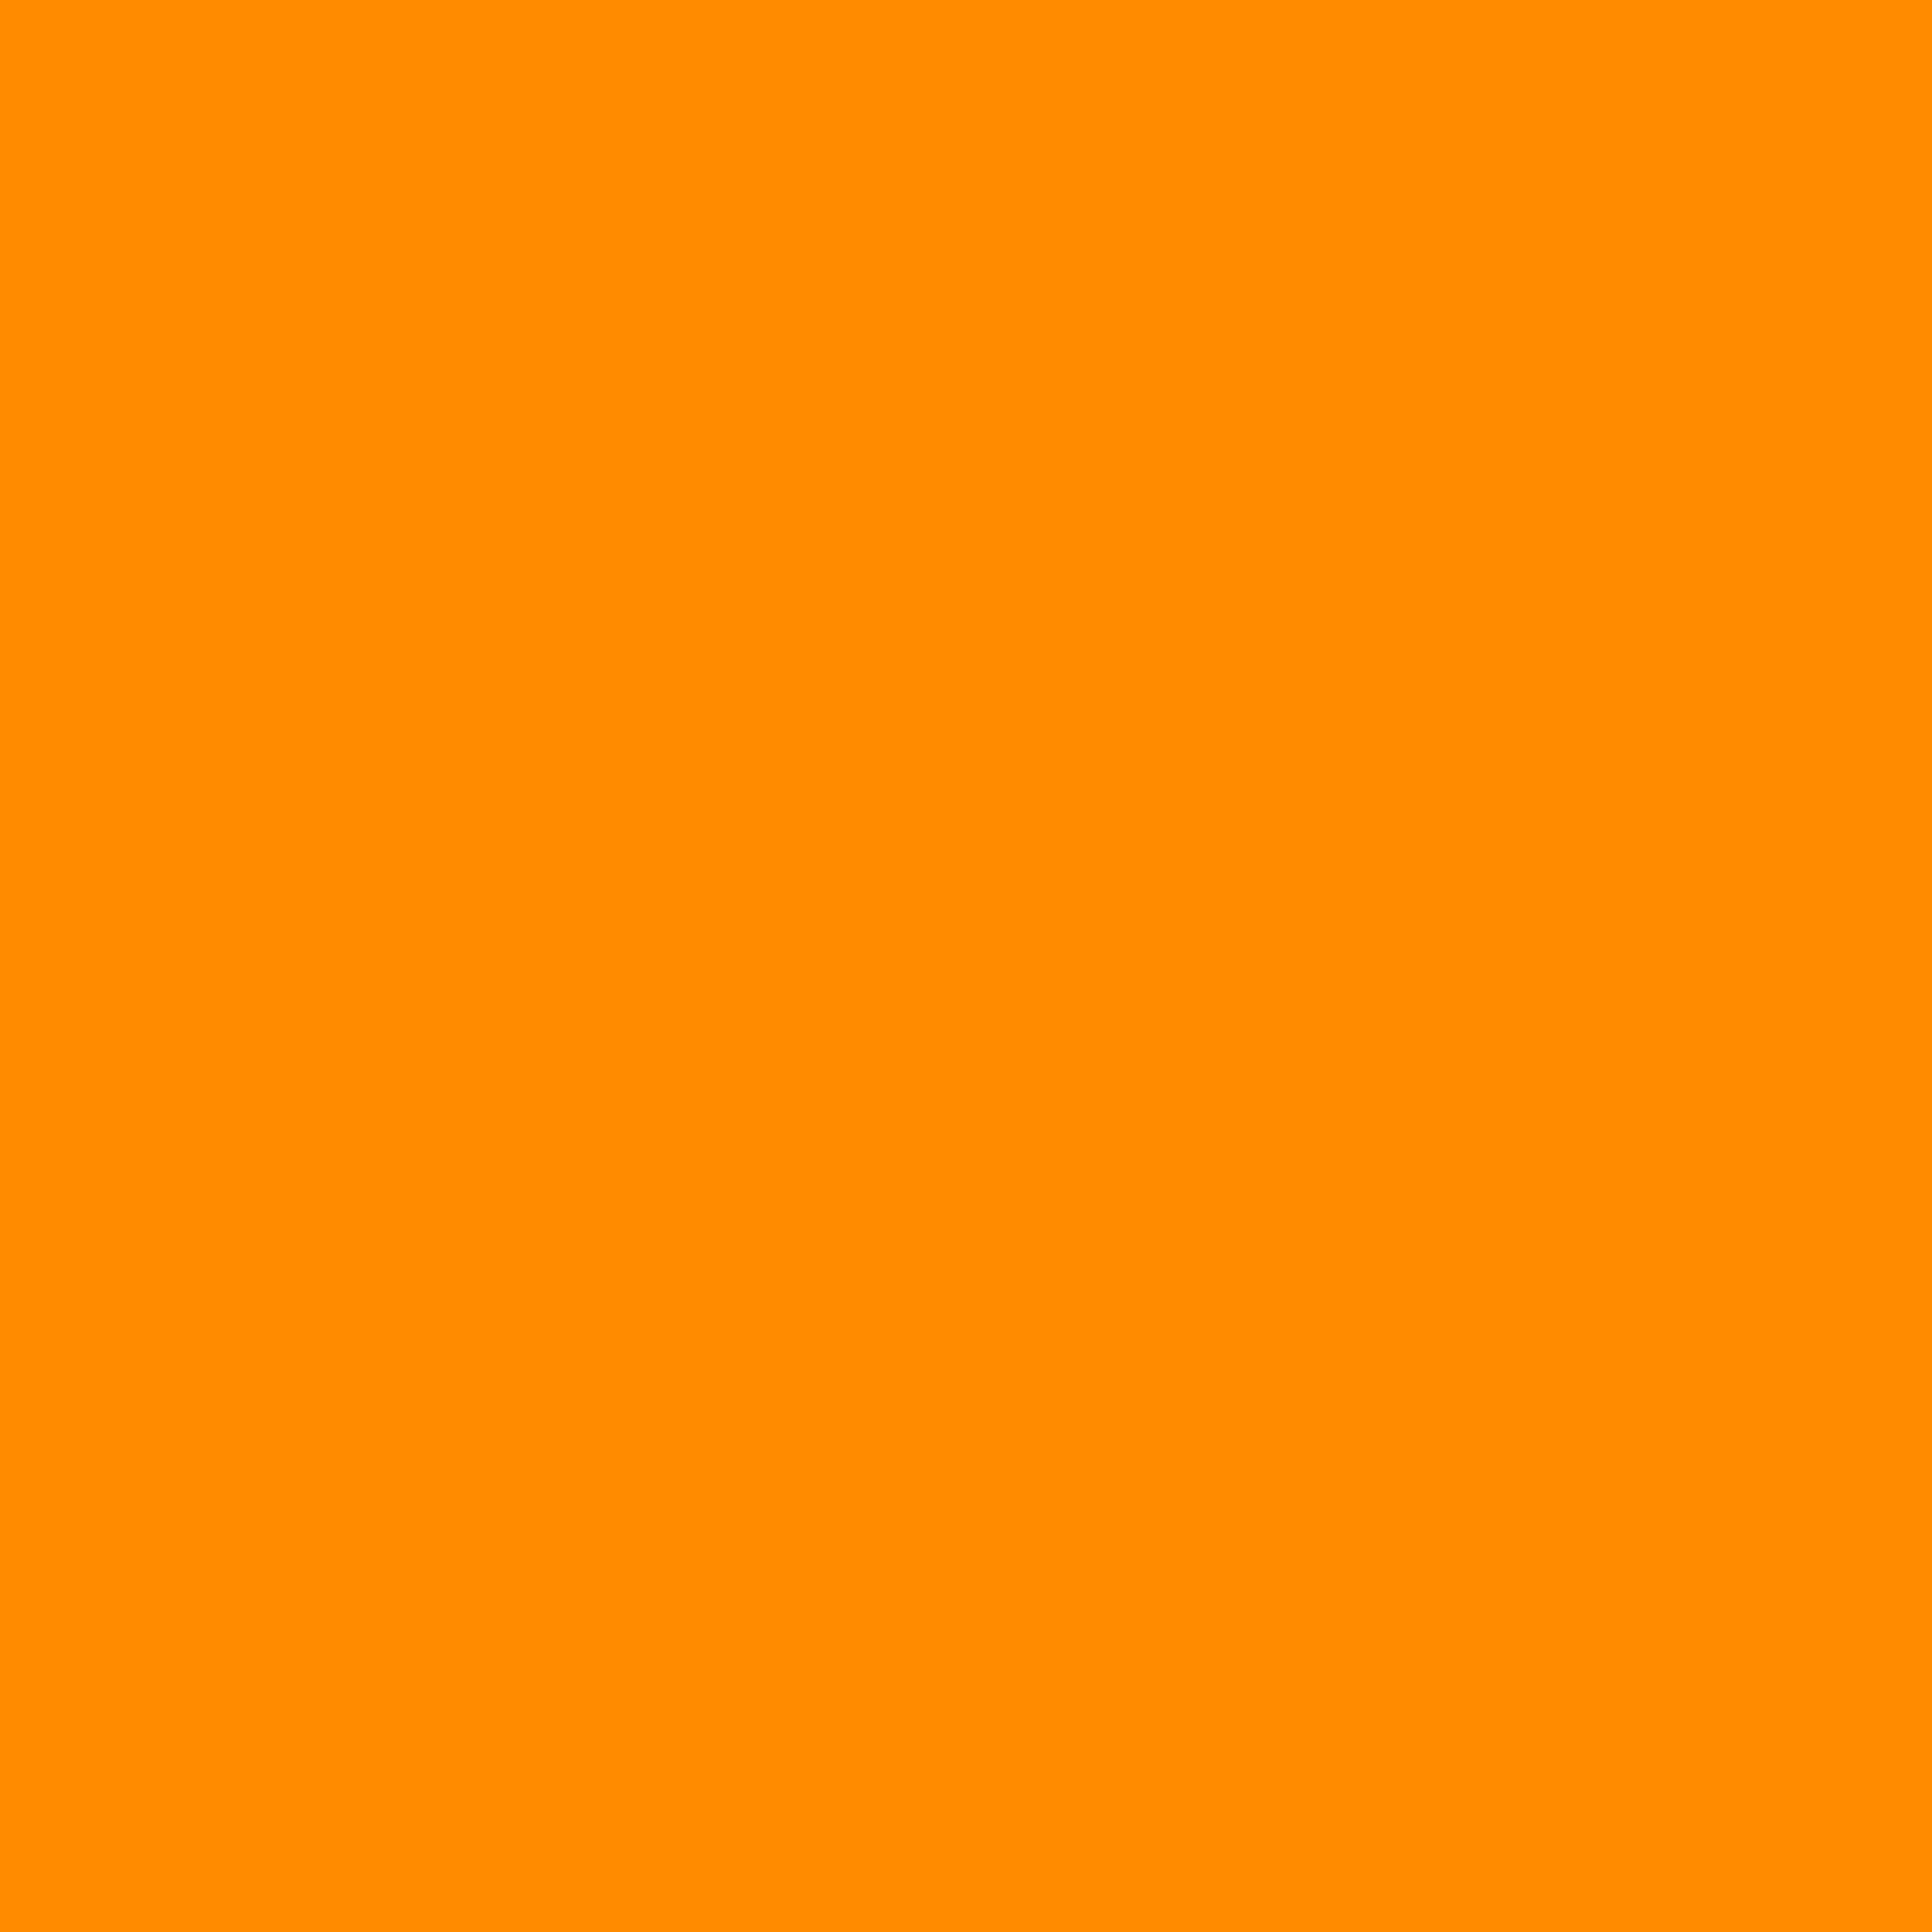 2732x2732 Dark Orange Solid Color Background